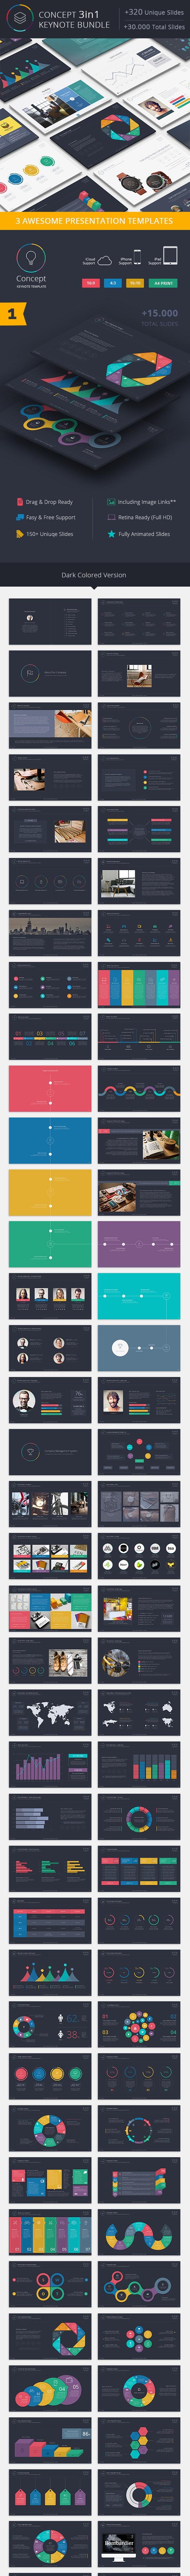 Concept Keynote Bundle - Creative Keynote Templates